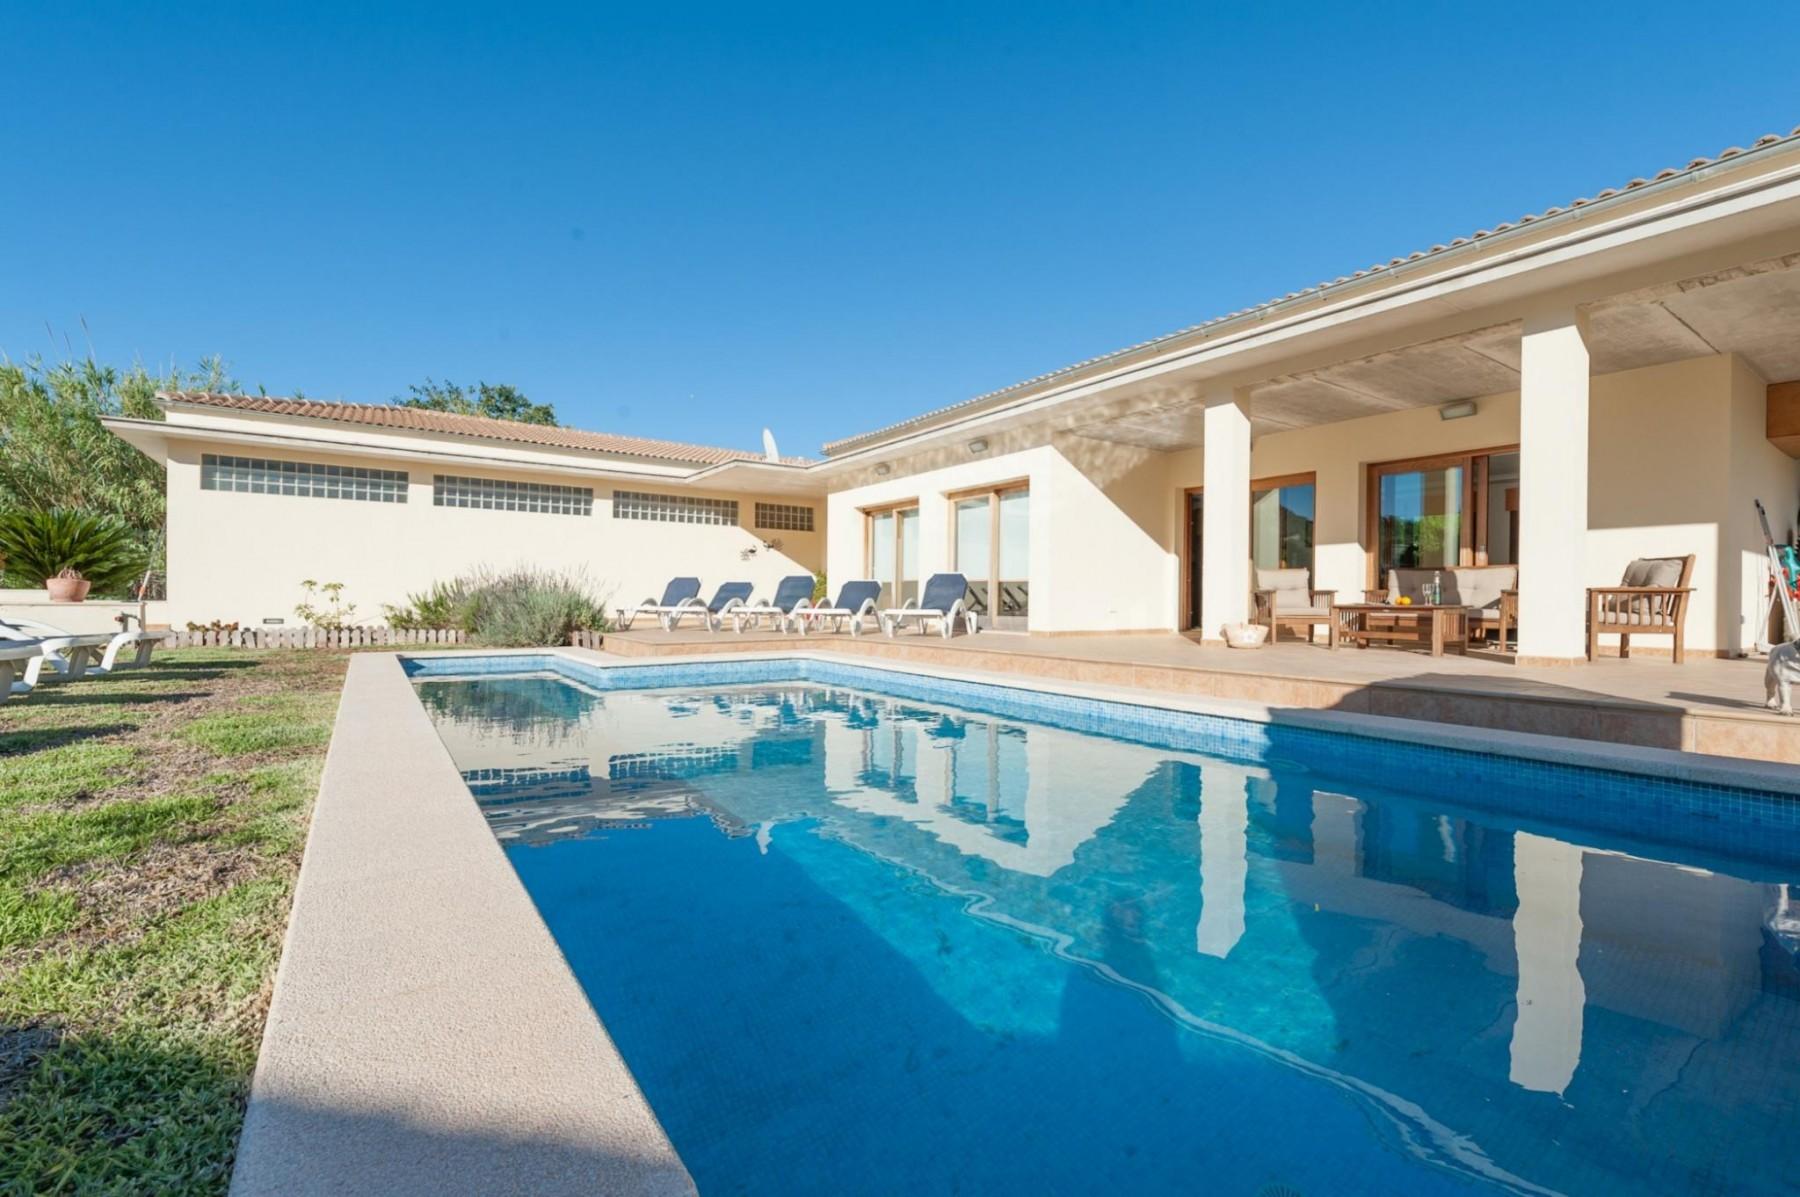 ARADA for 8 guests in Sa Pobla, Spanien